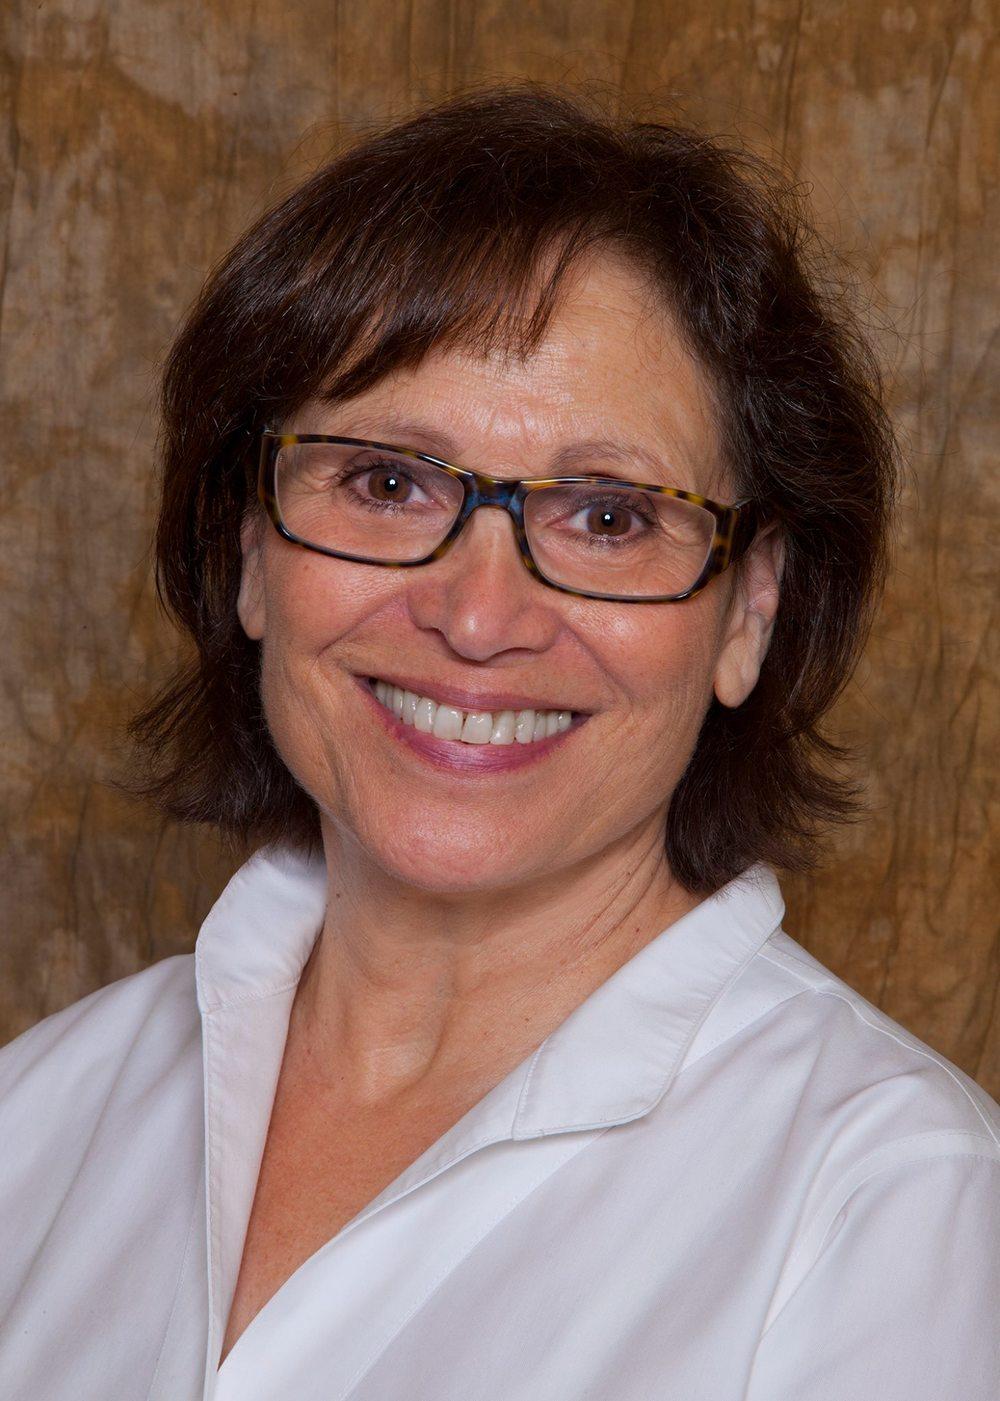 Communication on this topic: Denise Poirier, jennifer-nairn-smith/